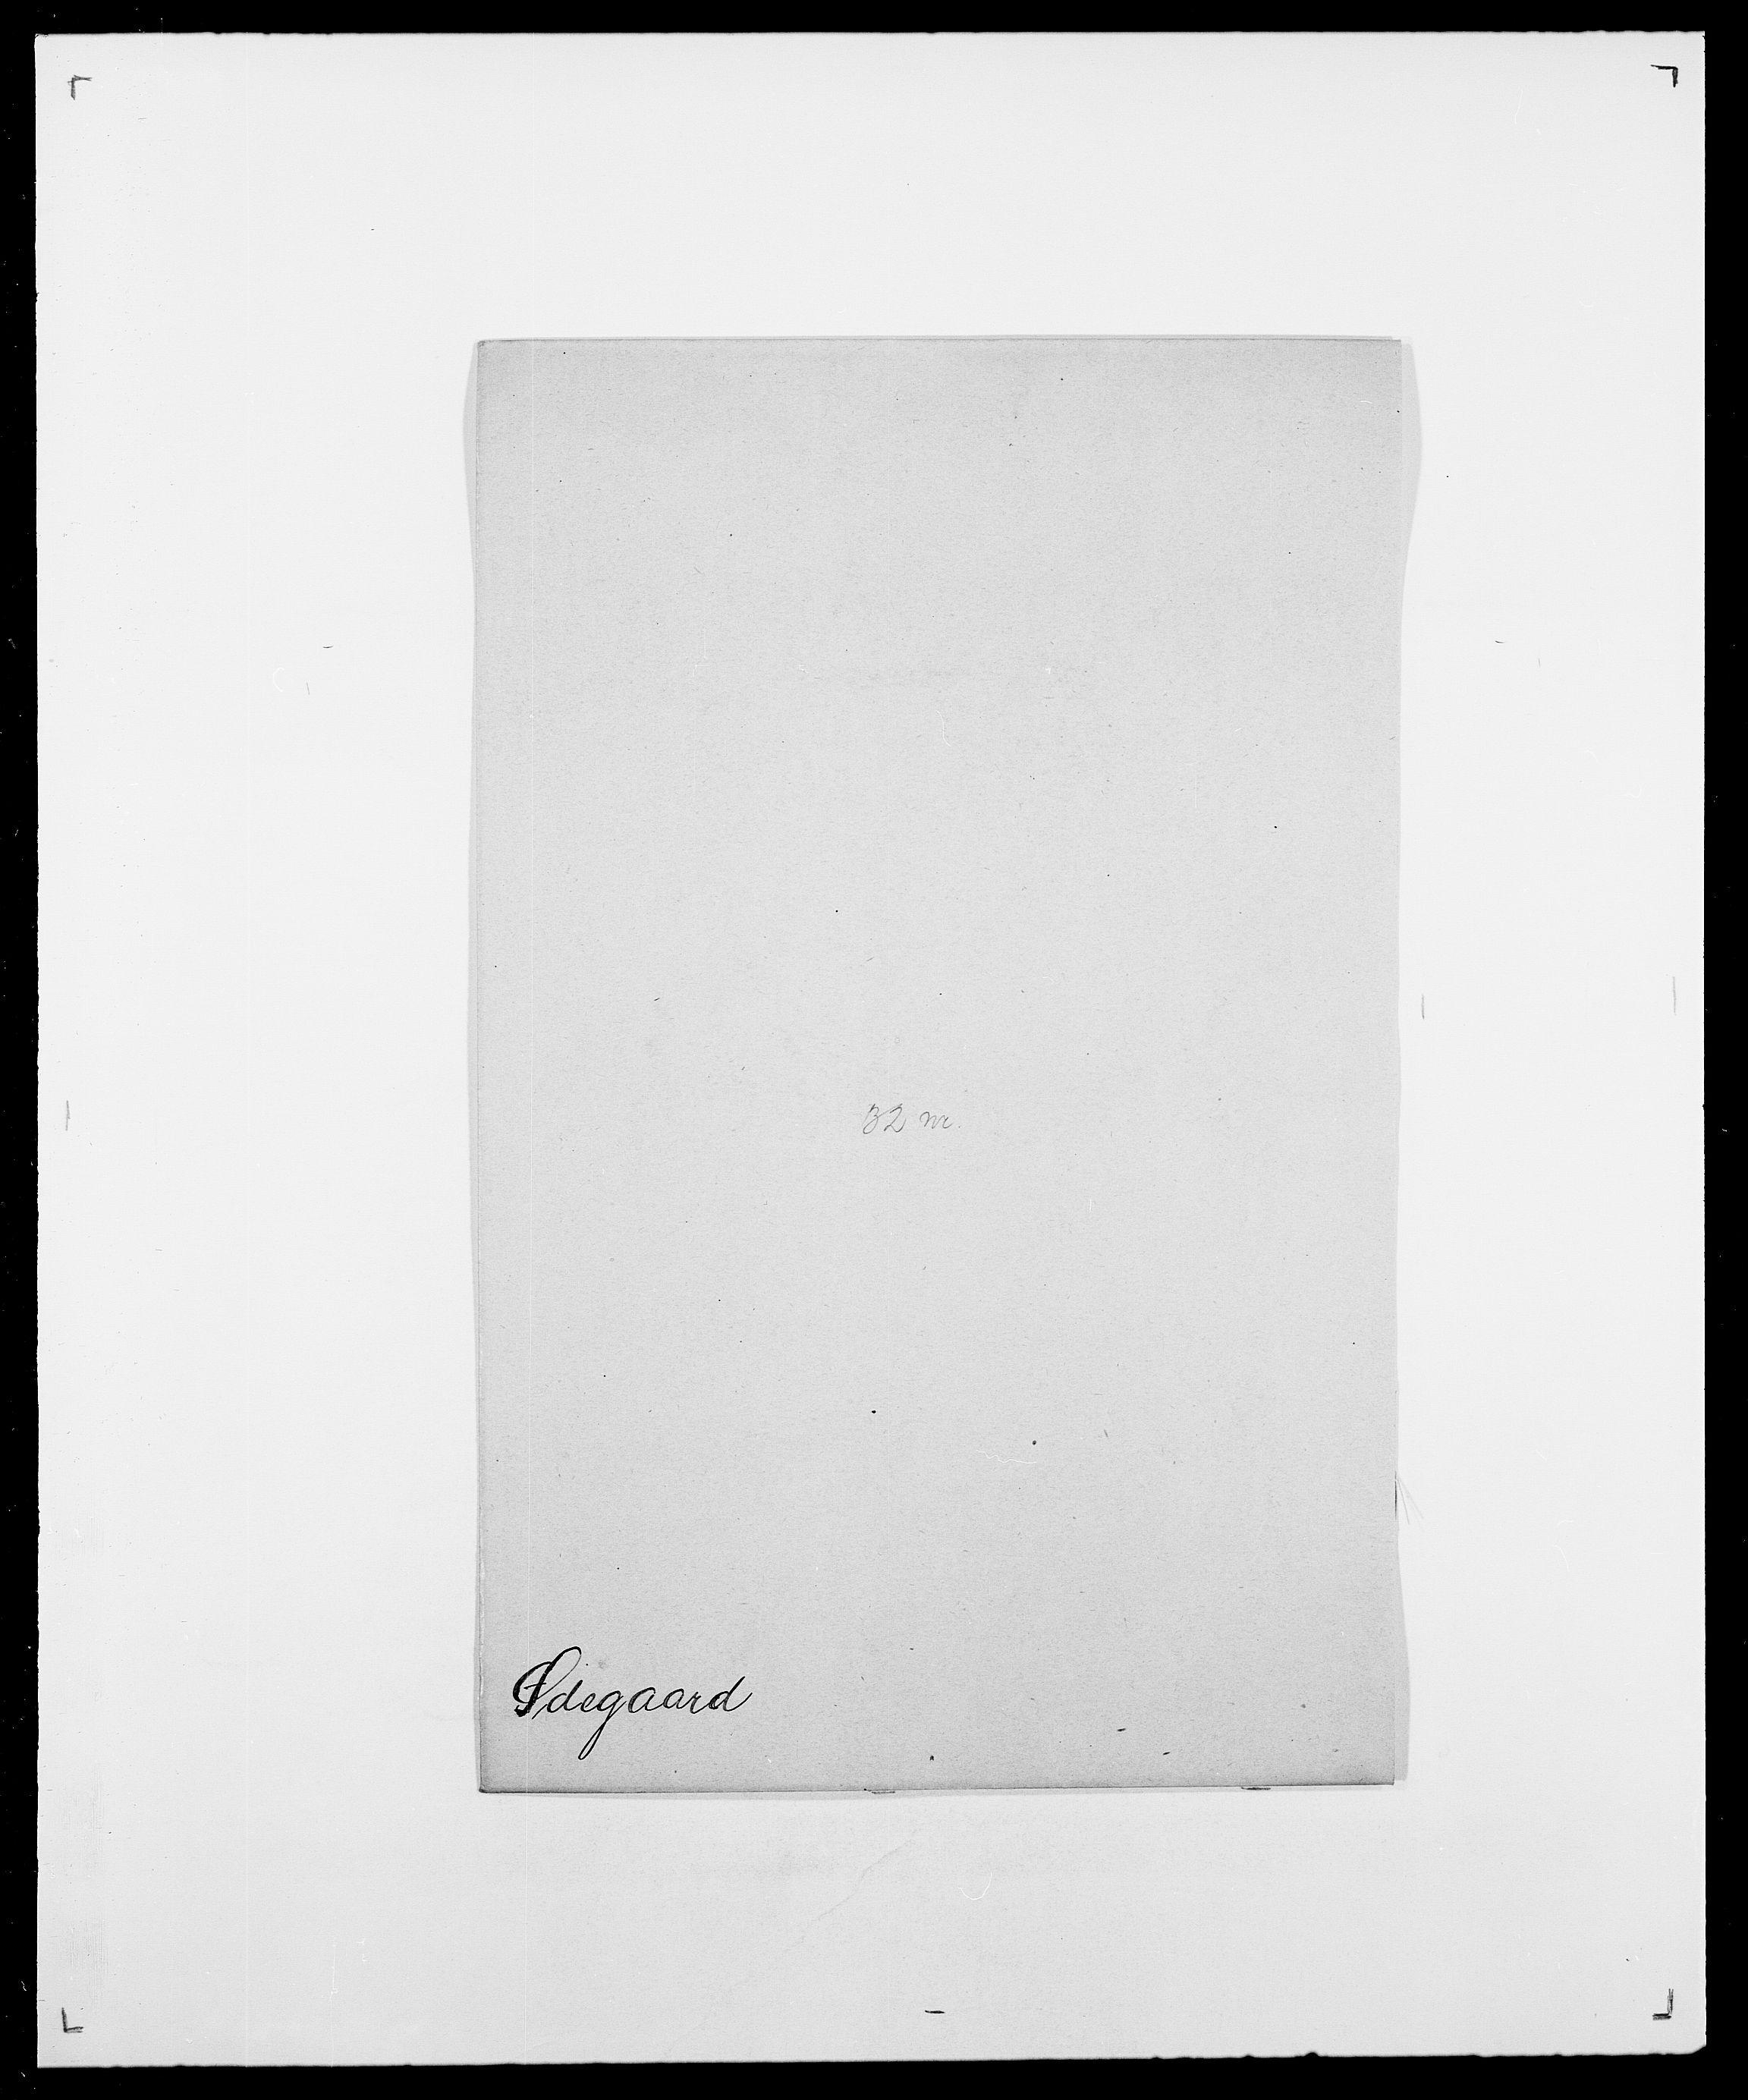 SAO, Delgobe, Charles Antoine - samling, D/Da/L0043: Wulfsberg - v. Zanten, s. 222